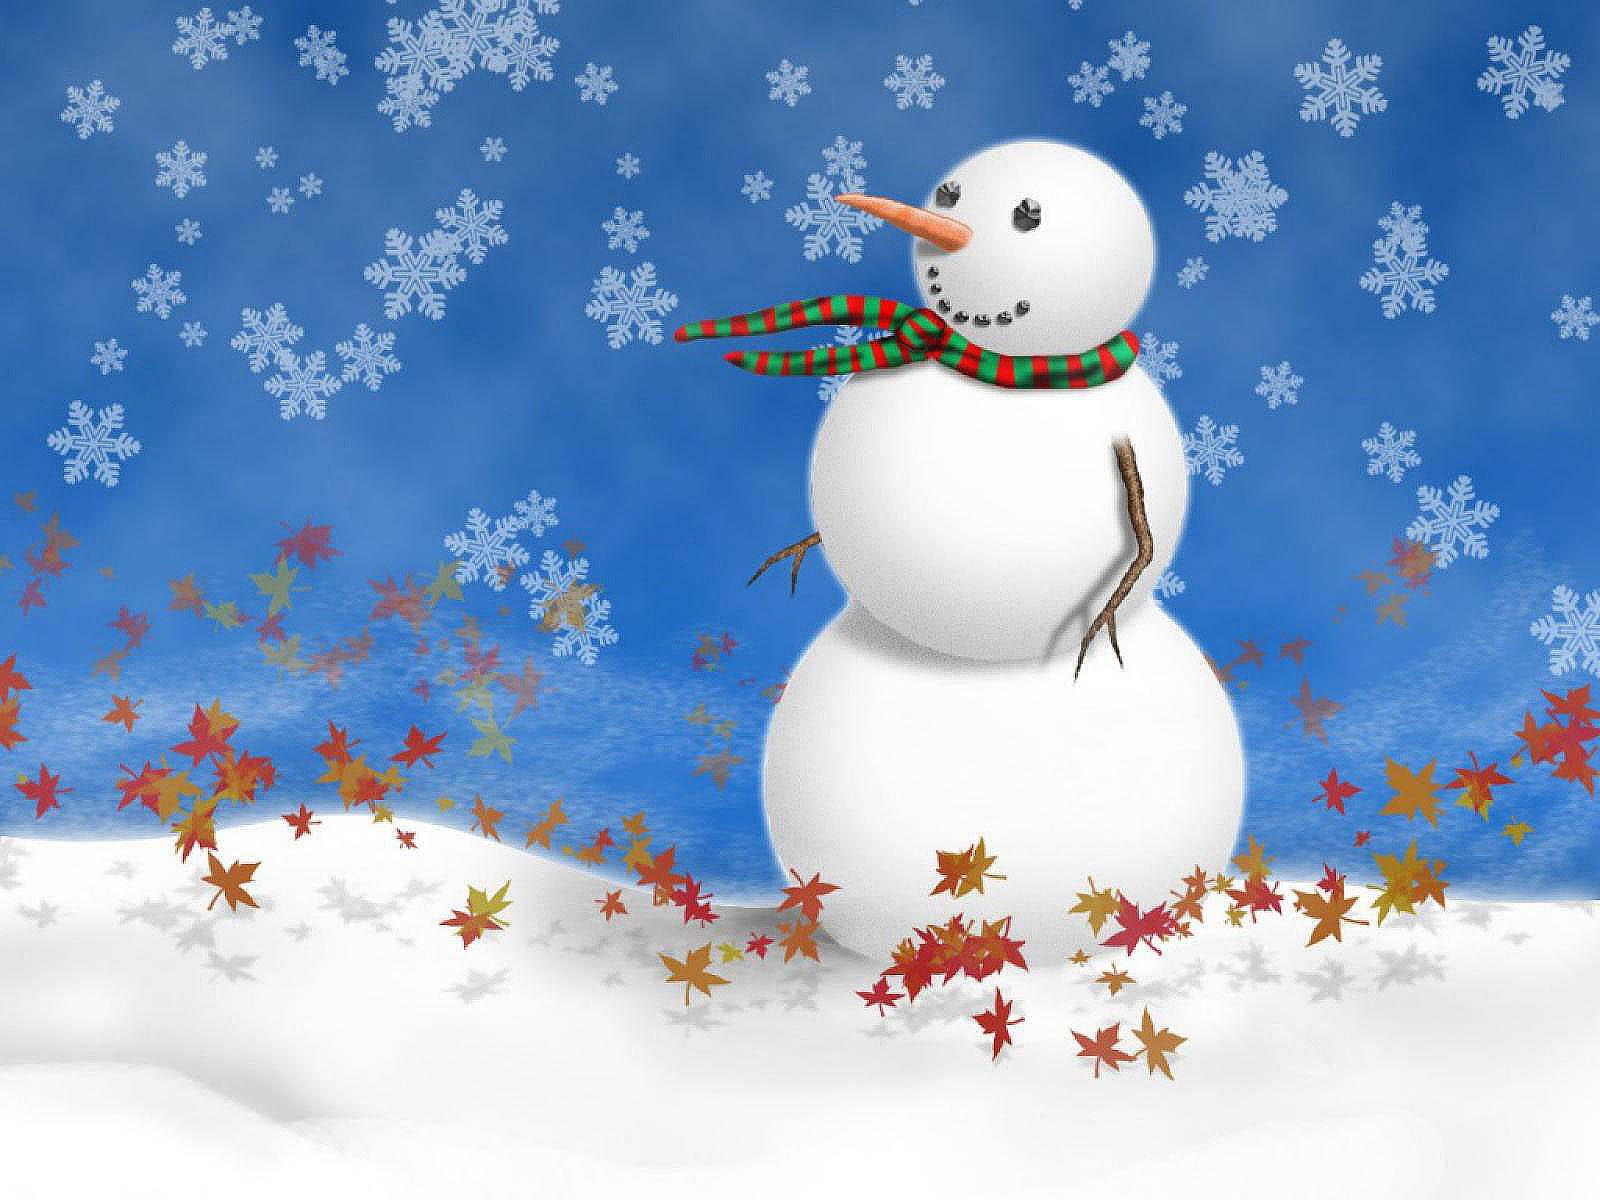 78] Snowman Wallpaper on WallpaperSafari 1600x1200